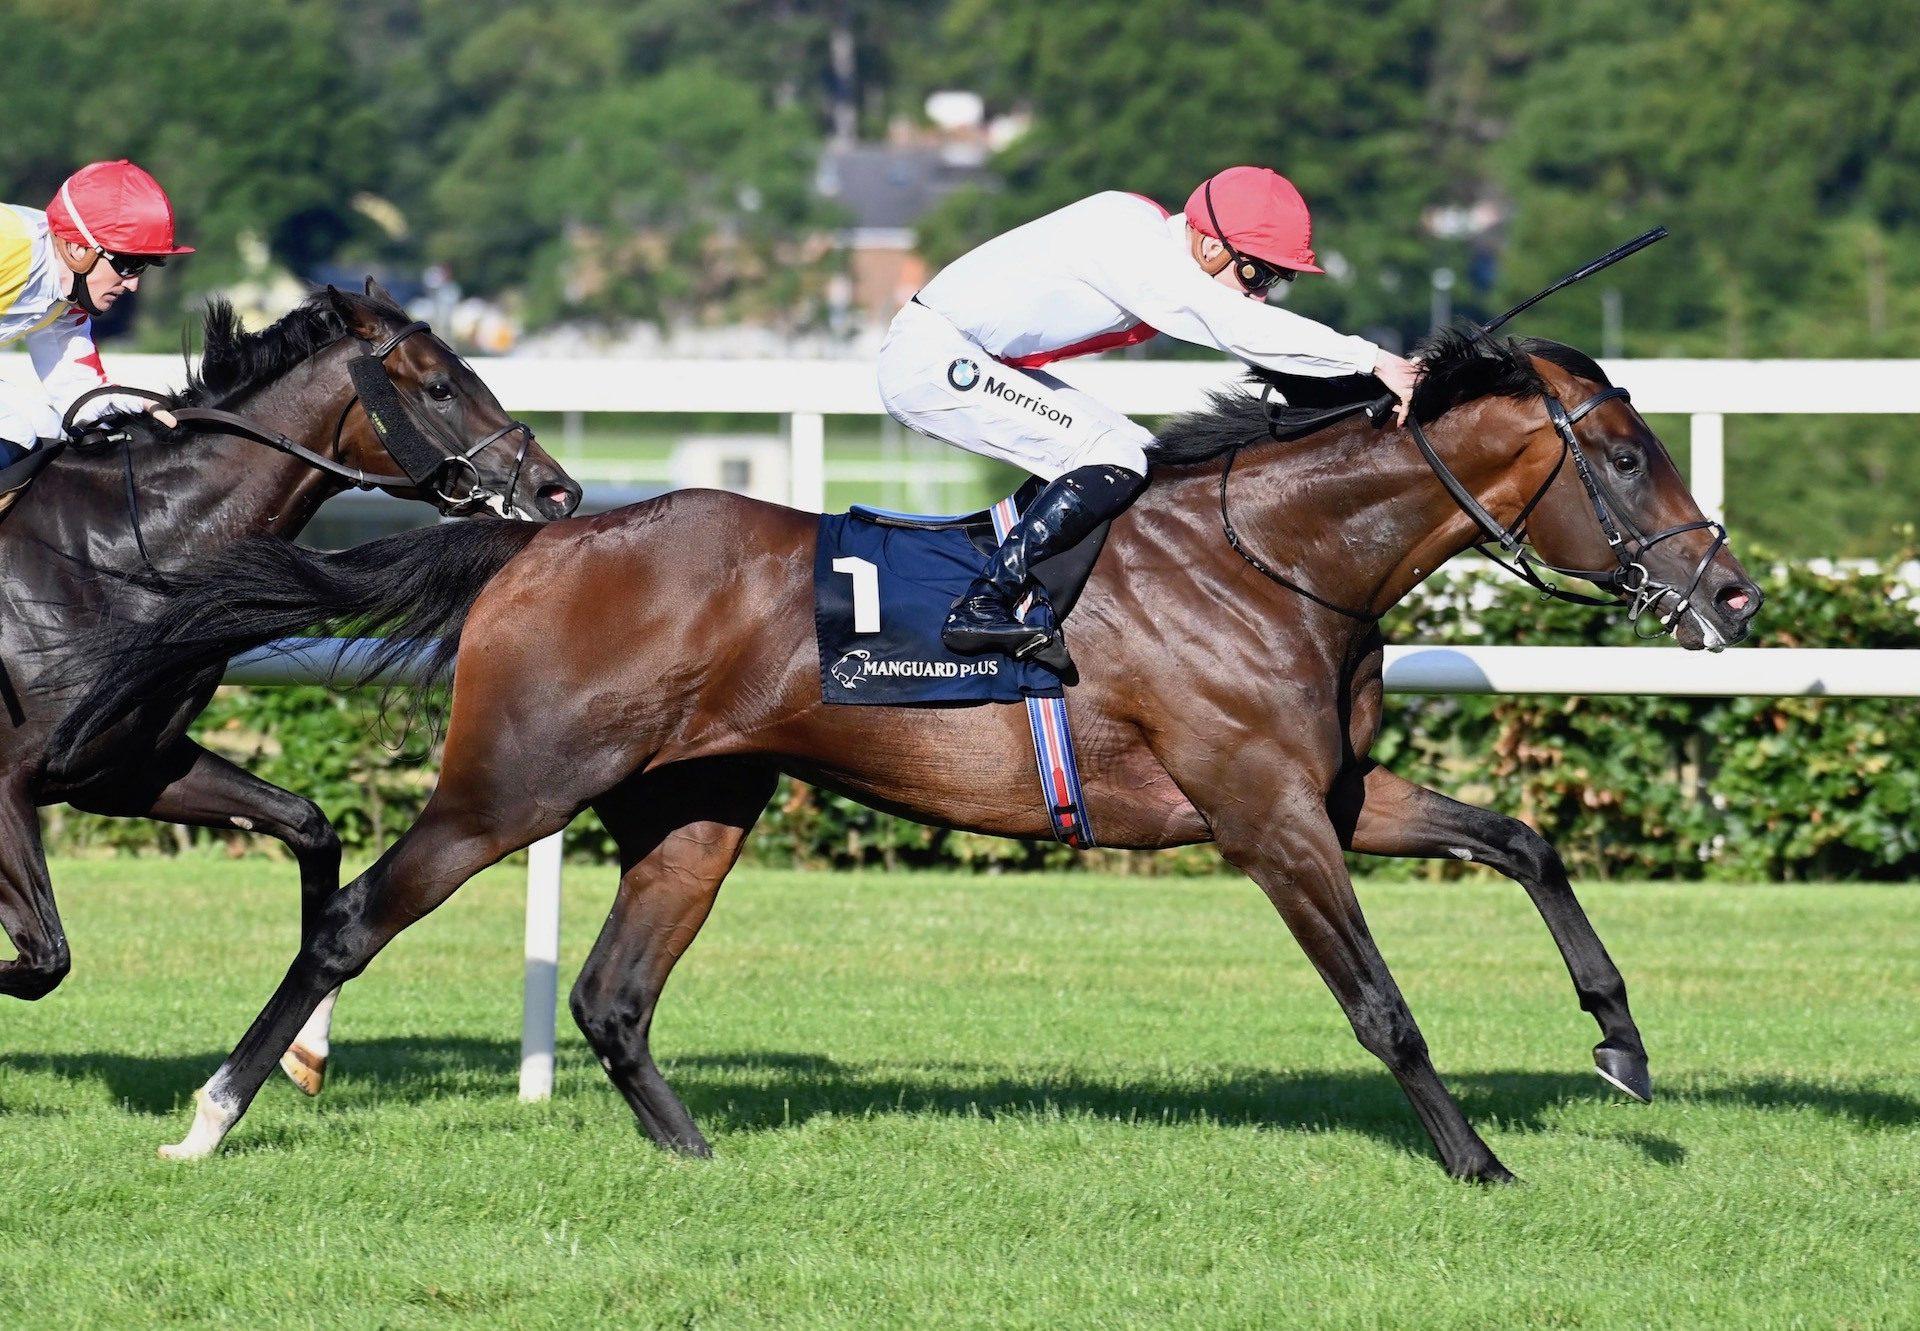 Gaheris (Camelot) Wins The Manguard Plus Maiden At Leopardstown